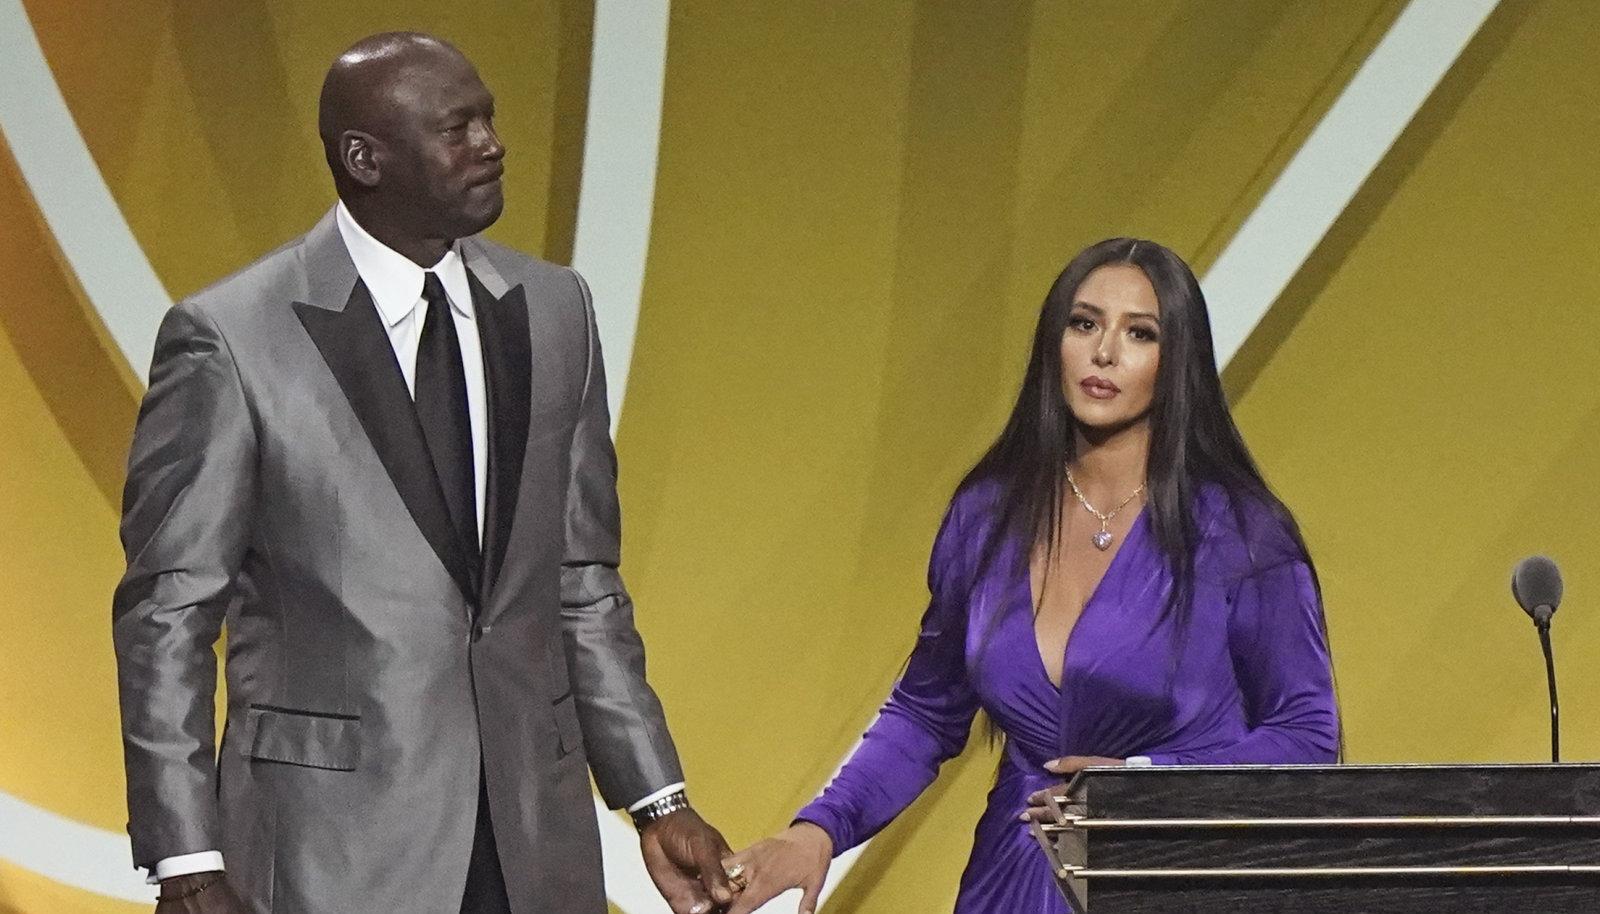 Michael Jordan ja Vanessa Bryant